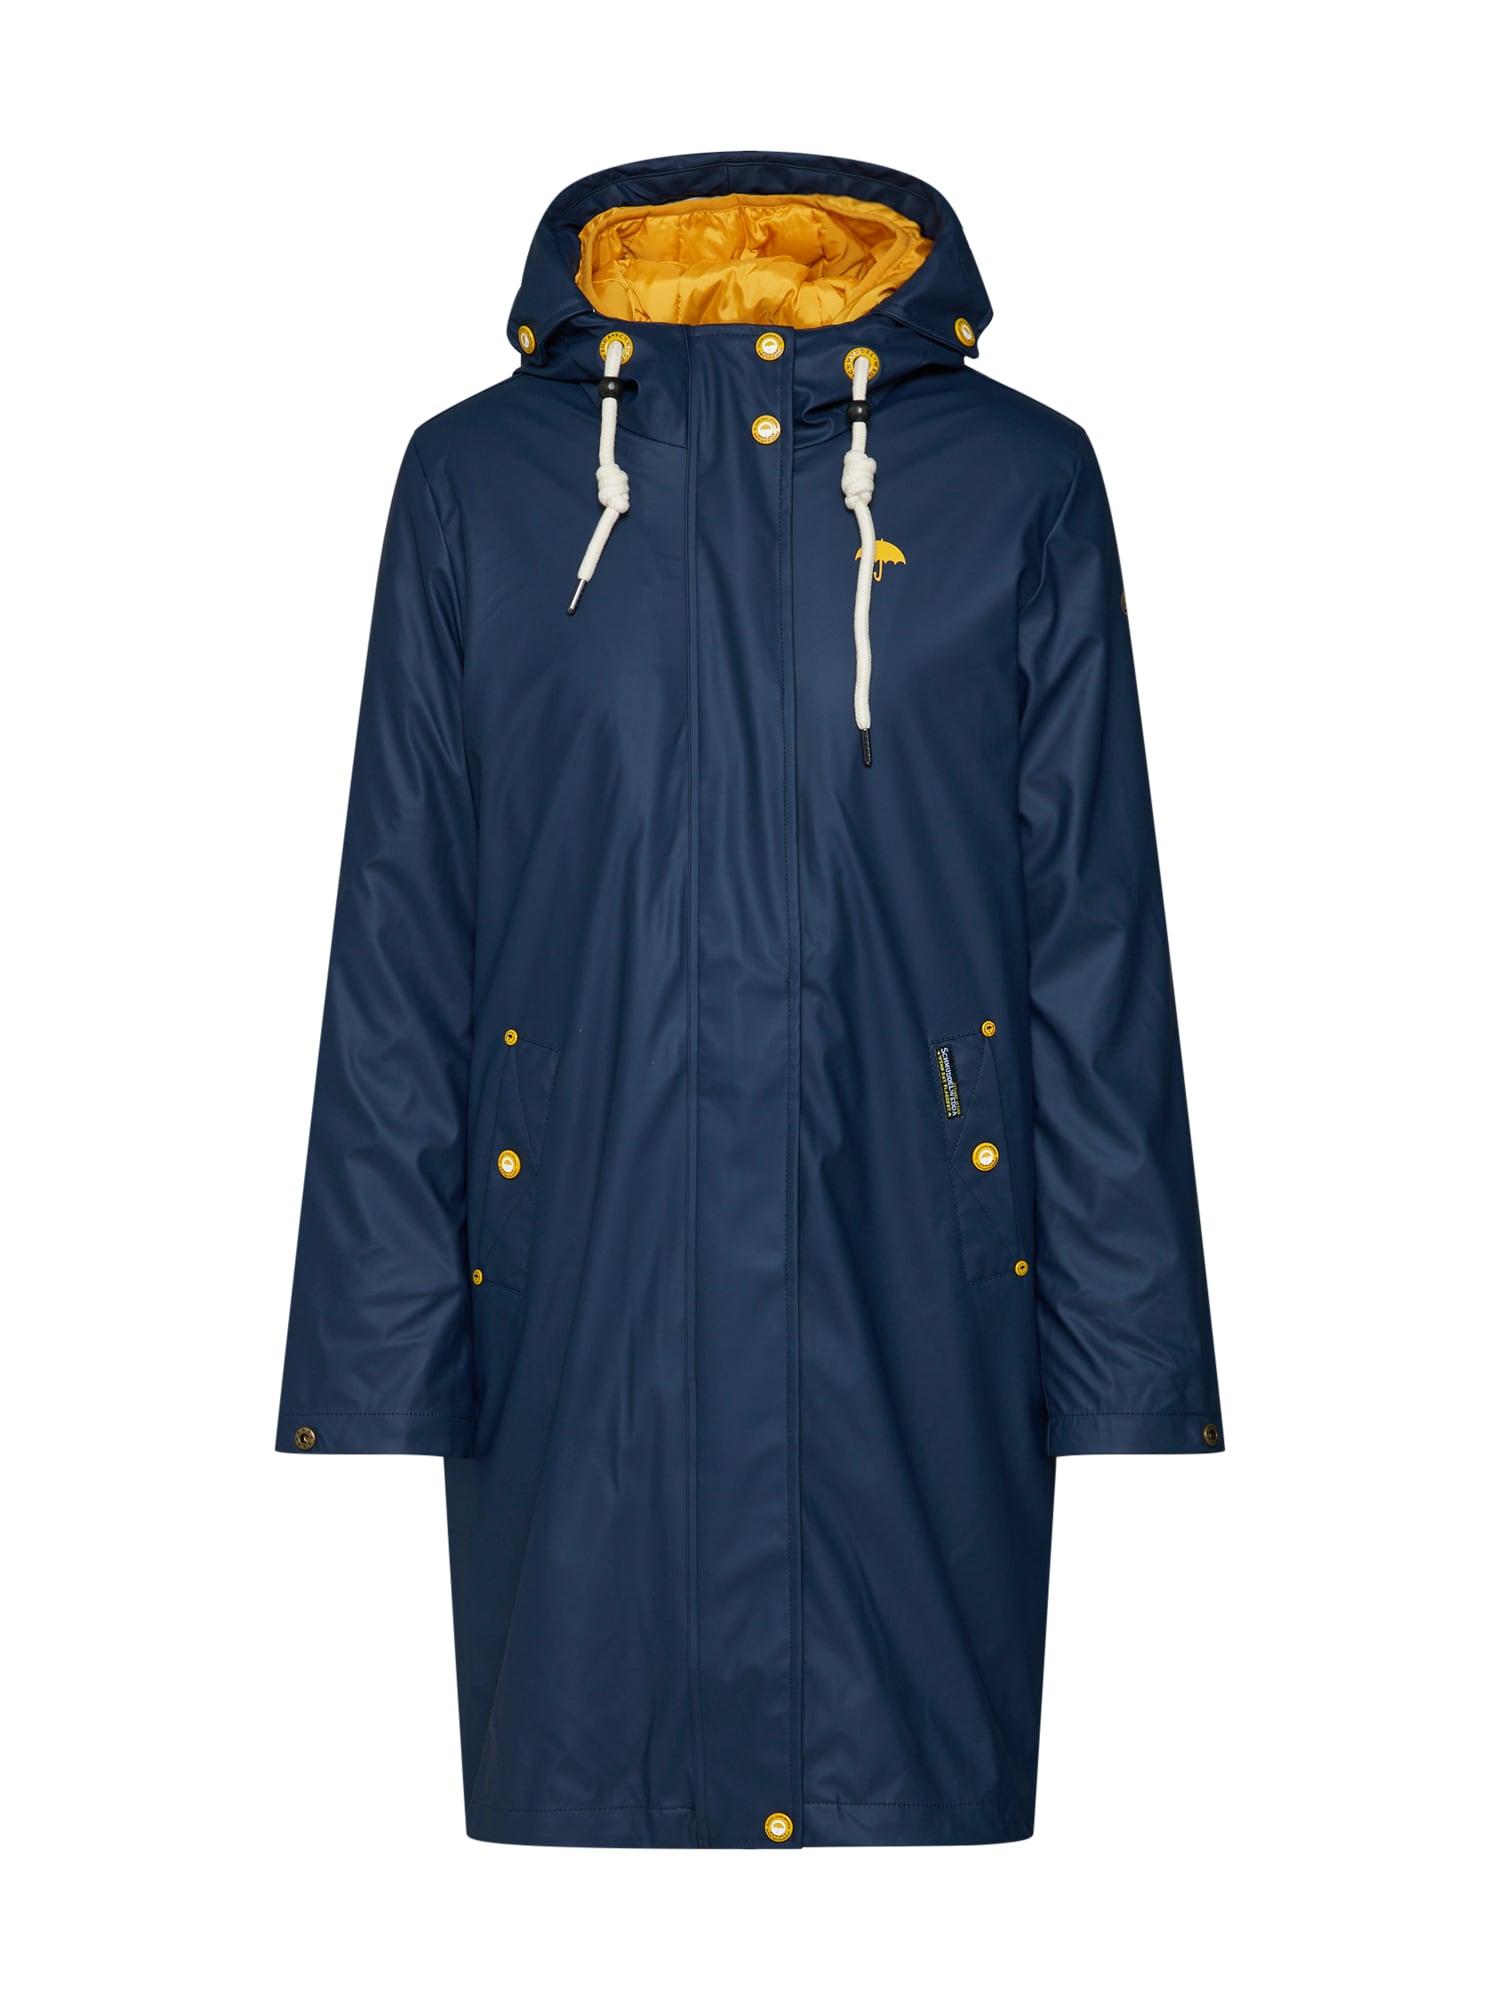 Schmuddelwedda Přechodný kabát  marine modrá